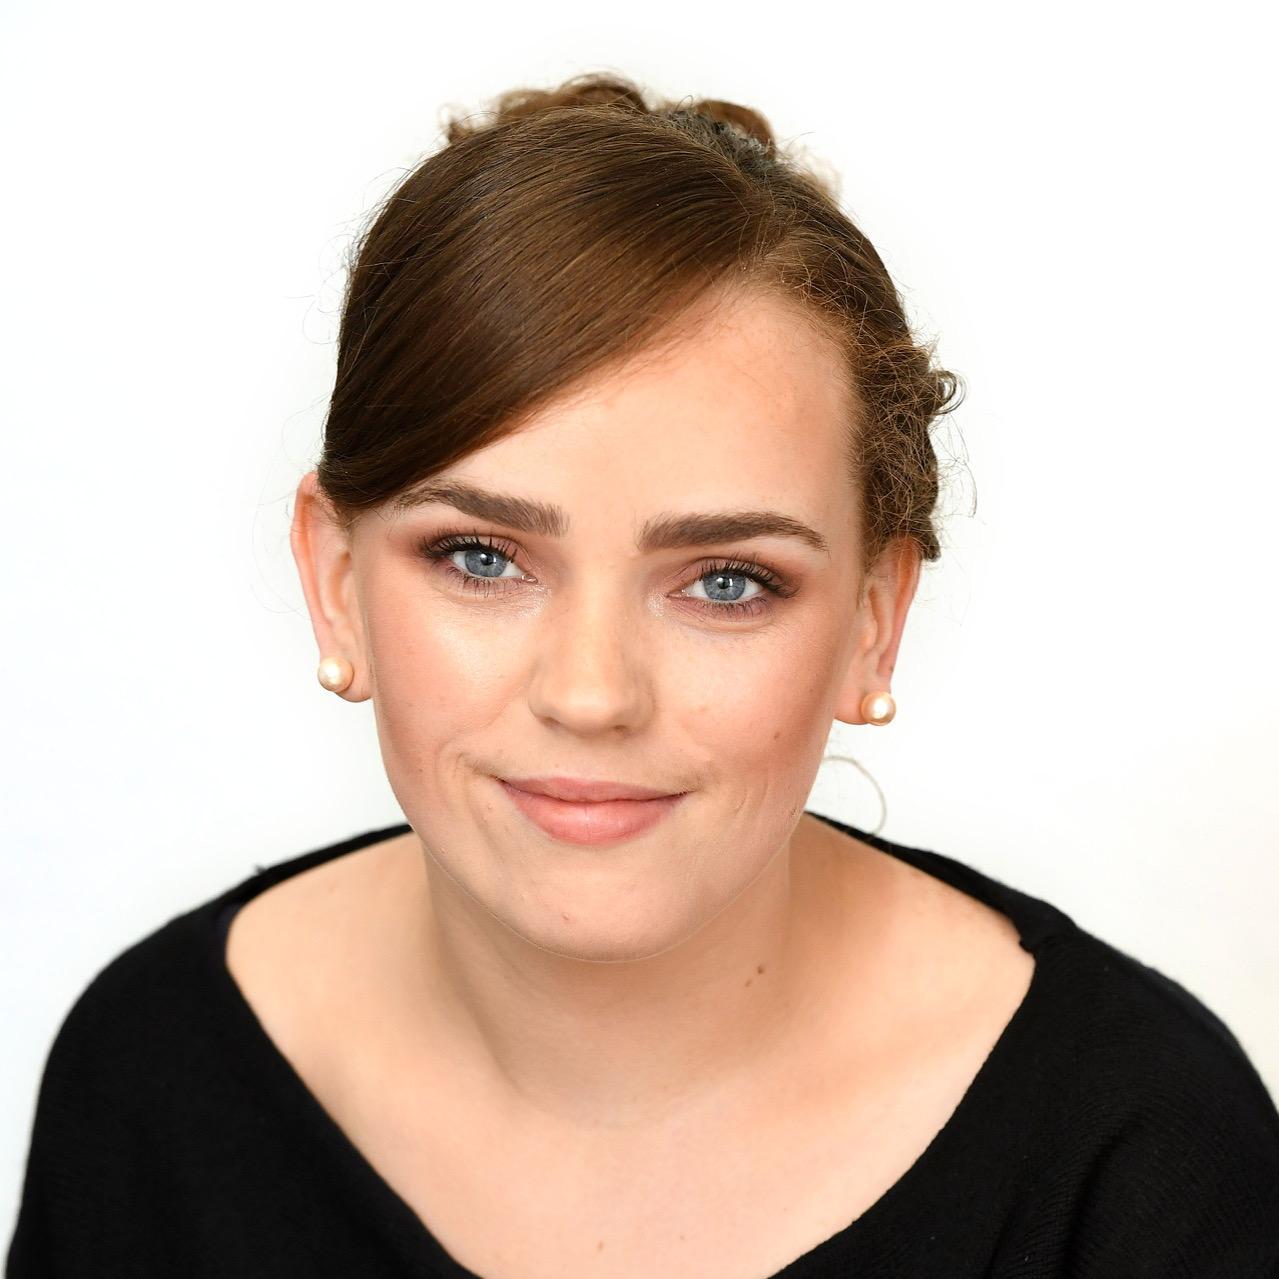 Katie McGonigle